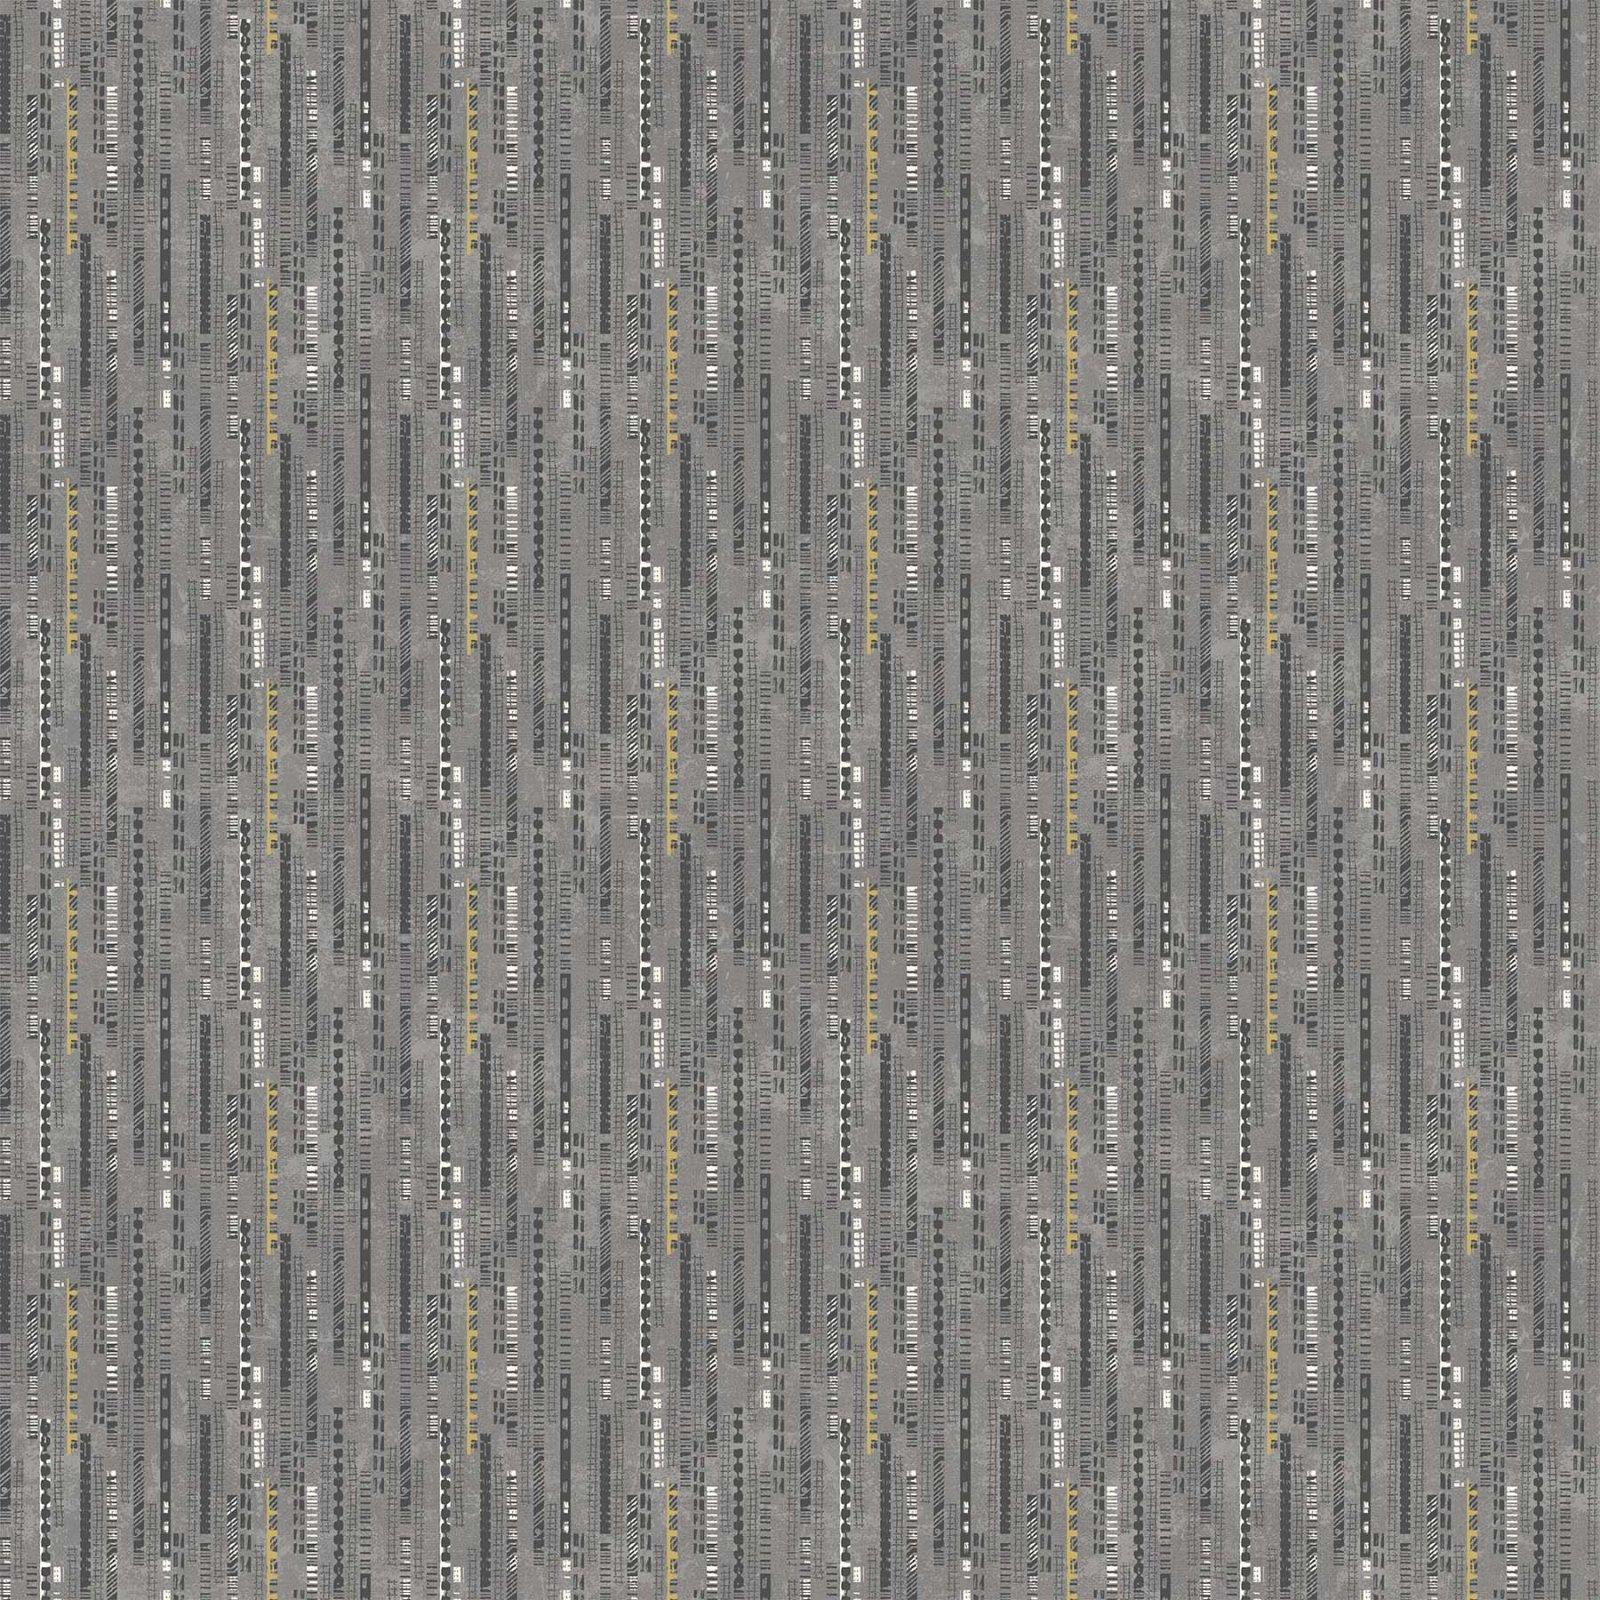 Northcott- Urban Grunge 22679 (color 94)